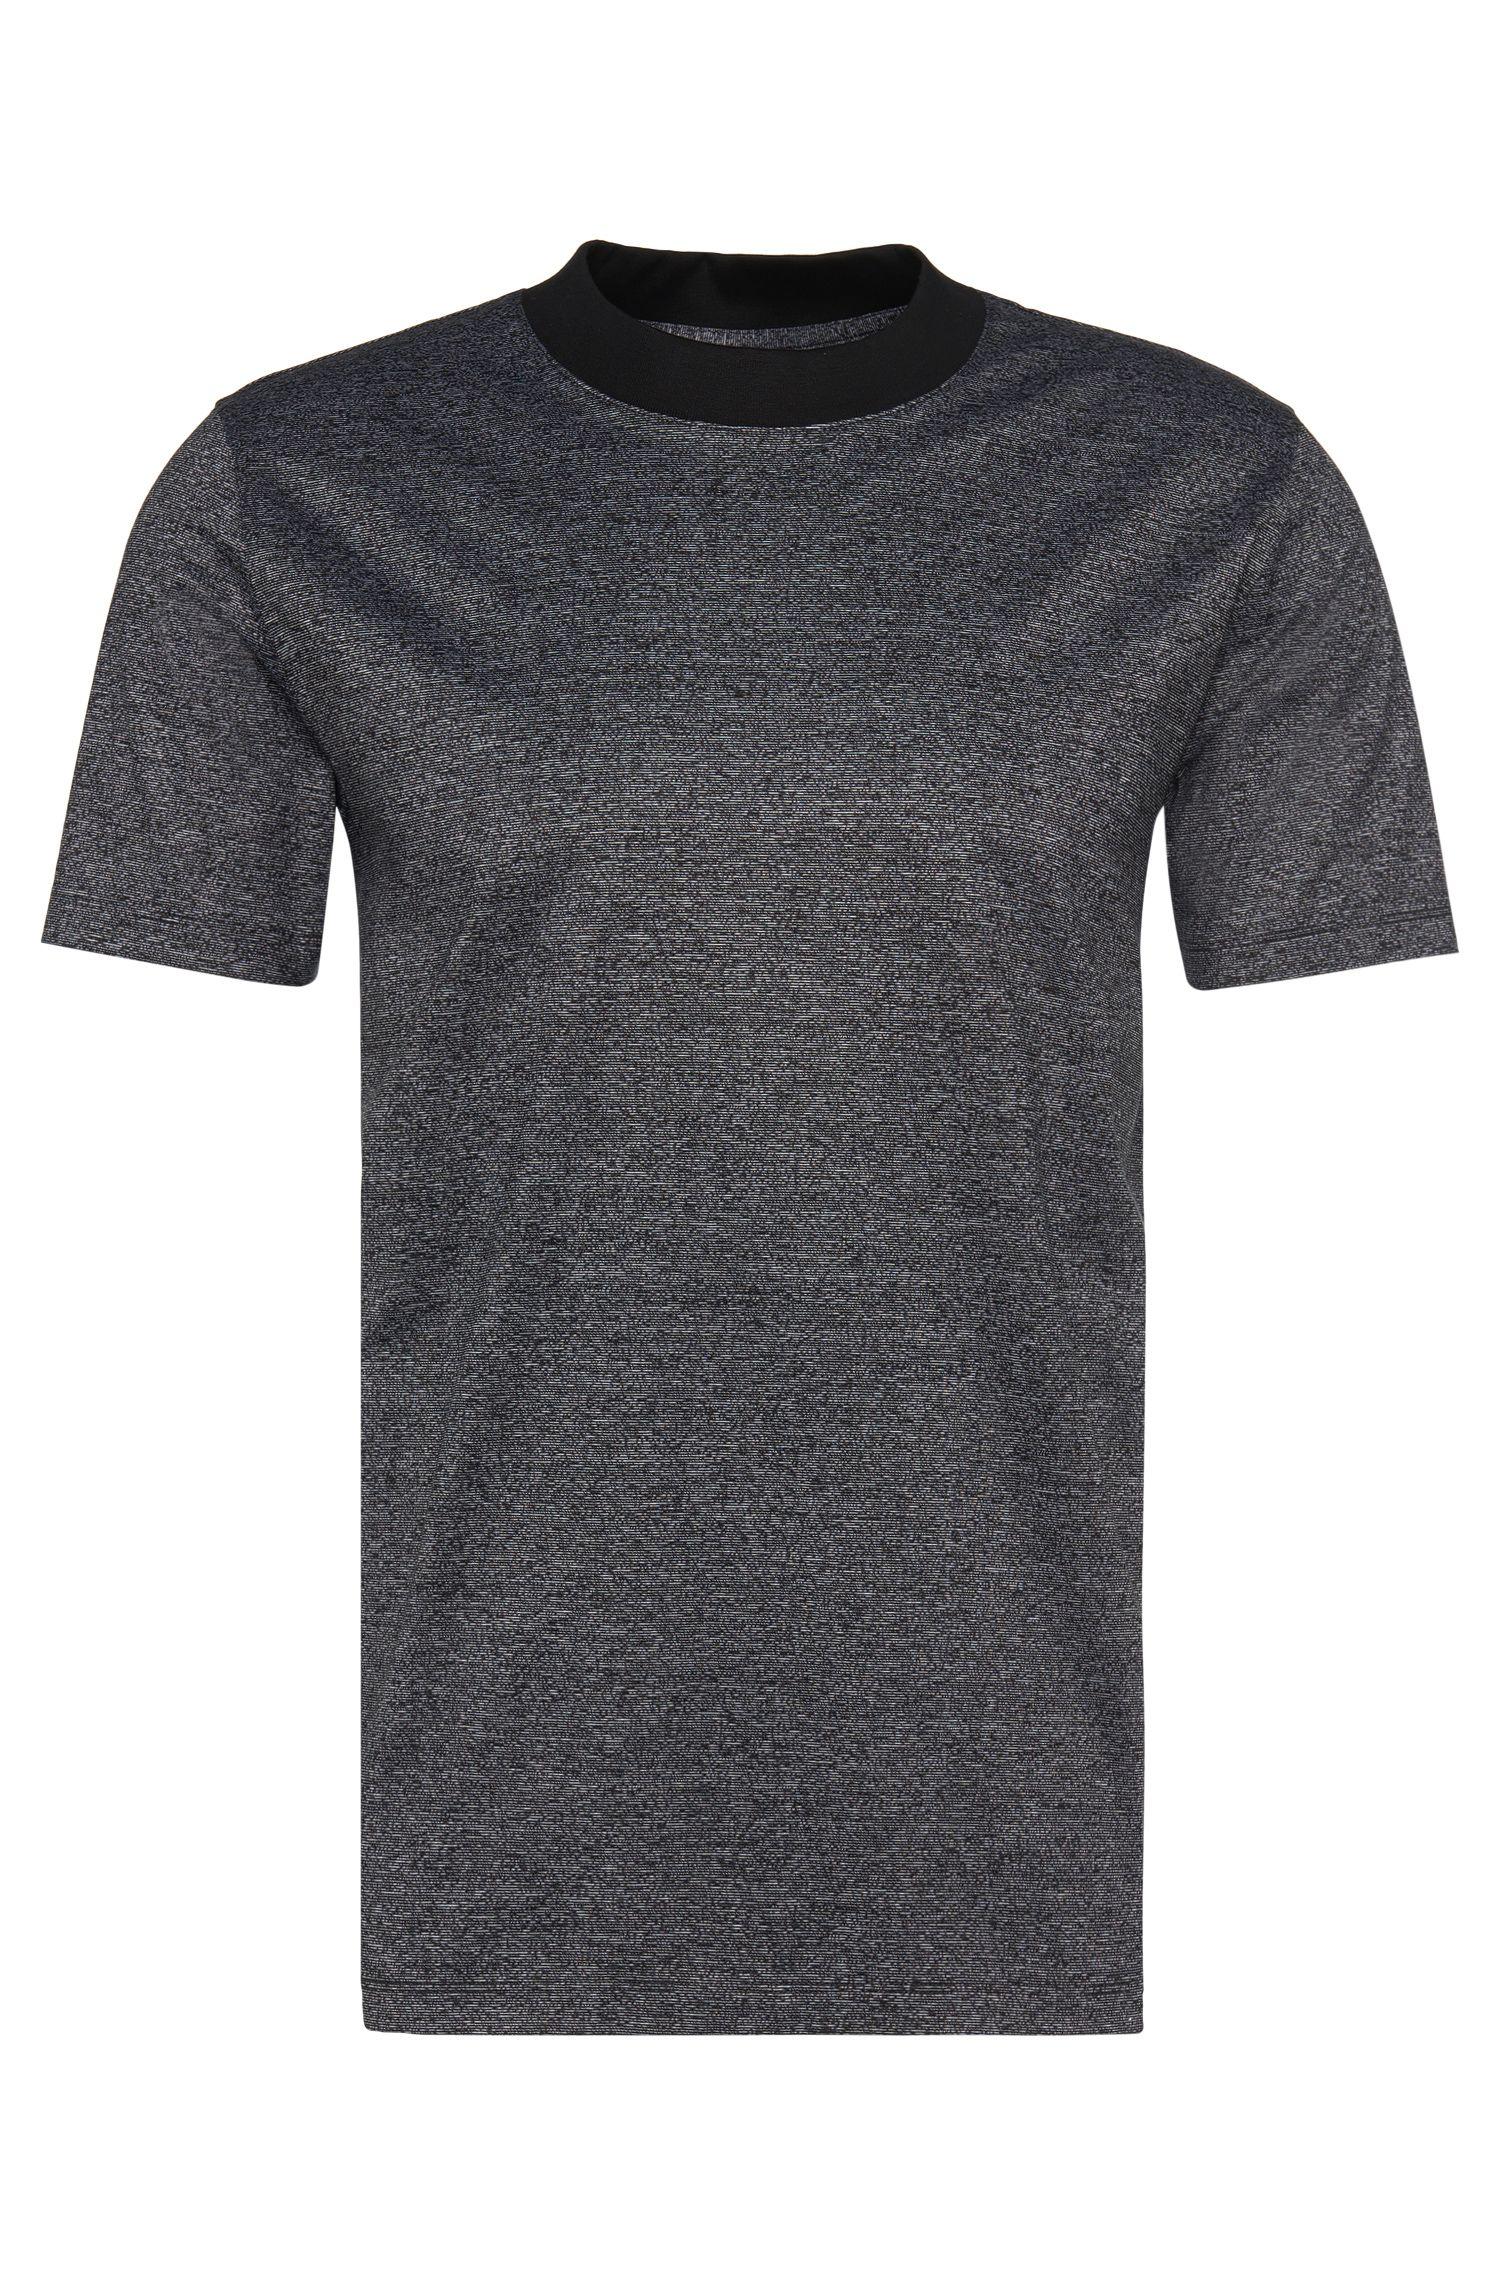 Loose-fit t-shirt in cotton with a round neckline: 'Dorenz'